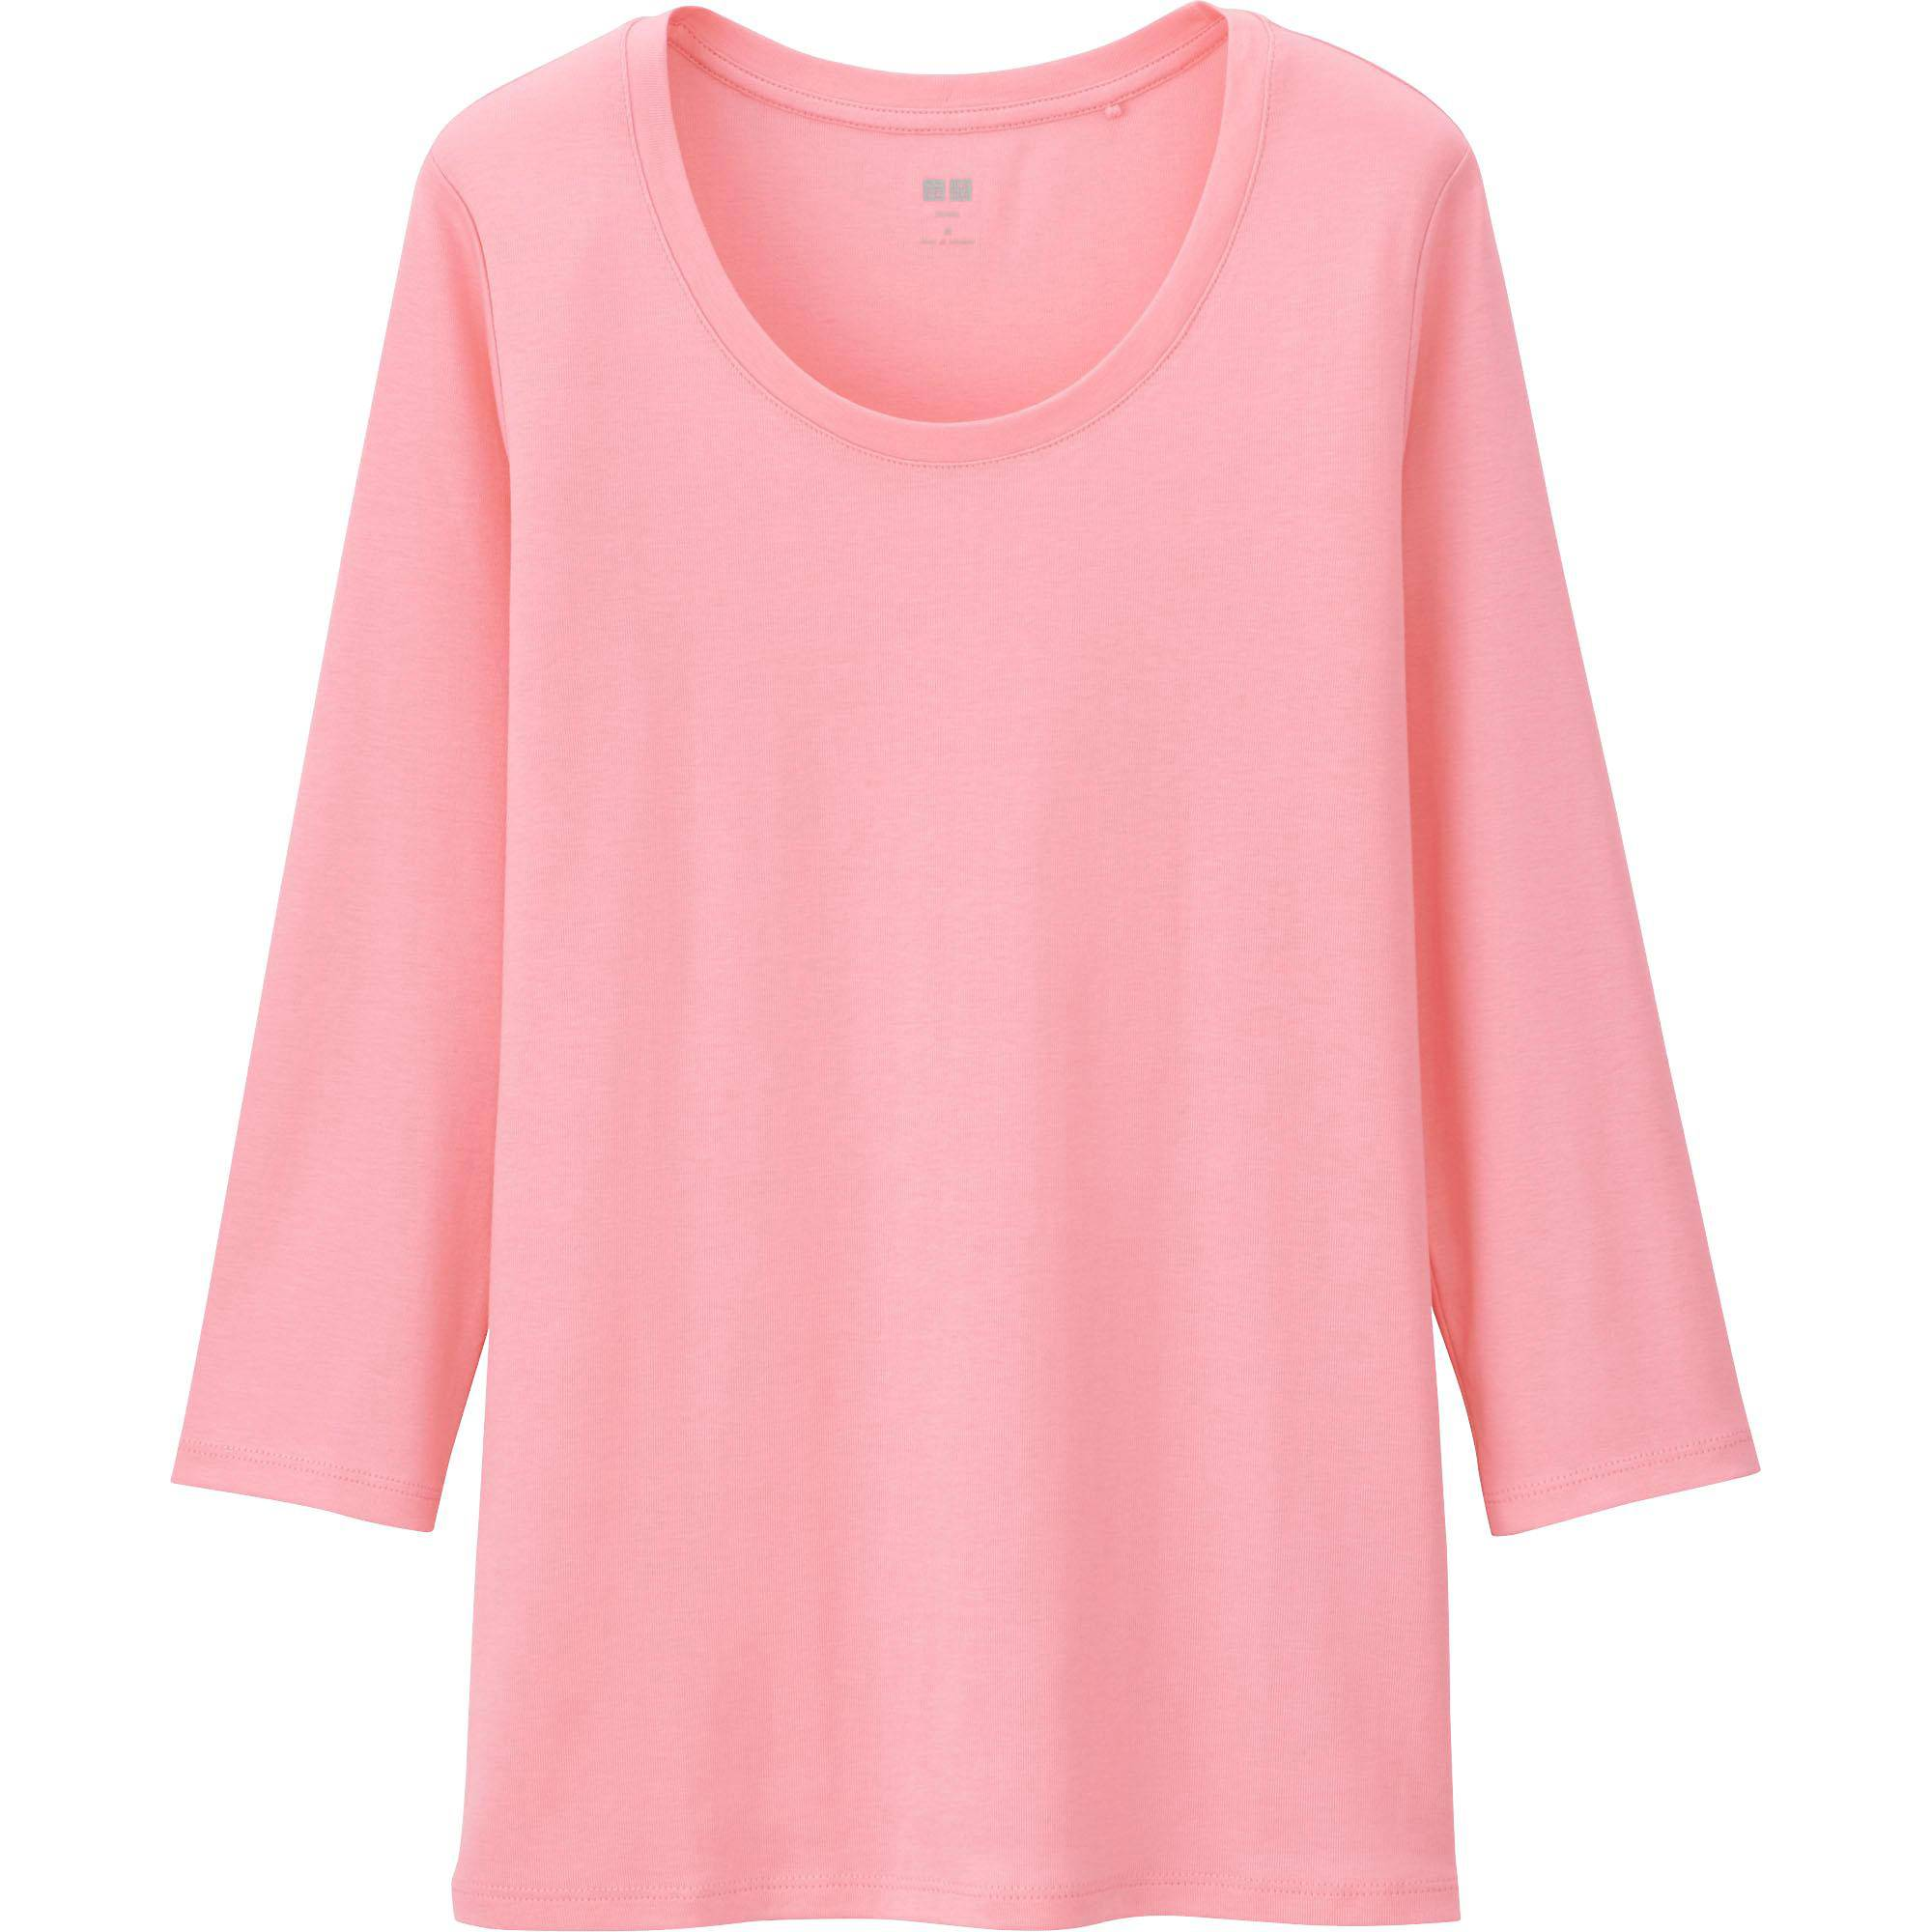 Women's Supima® Cotton 3/4 Sleeve Crew Neck T-Shirt | UNIQLO US